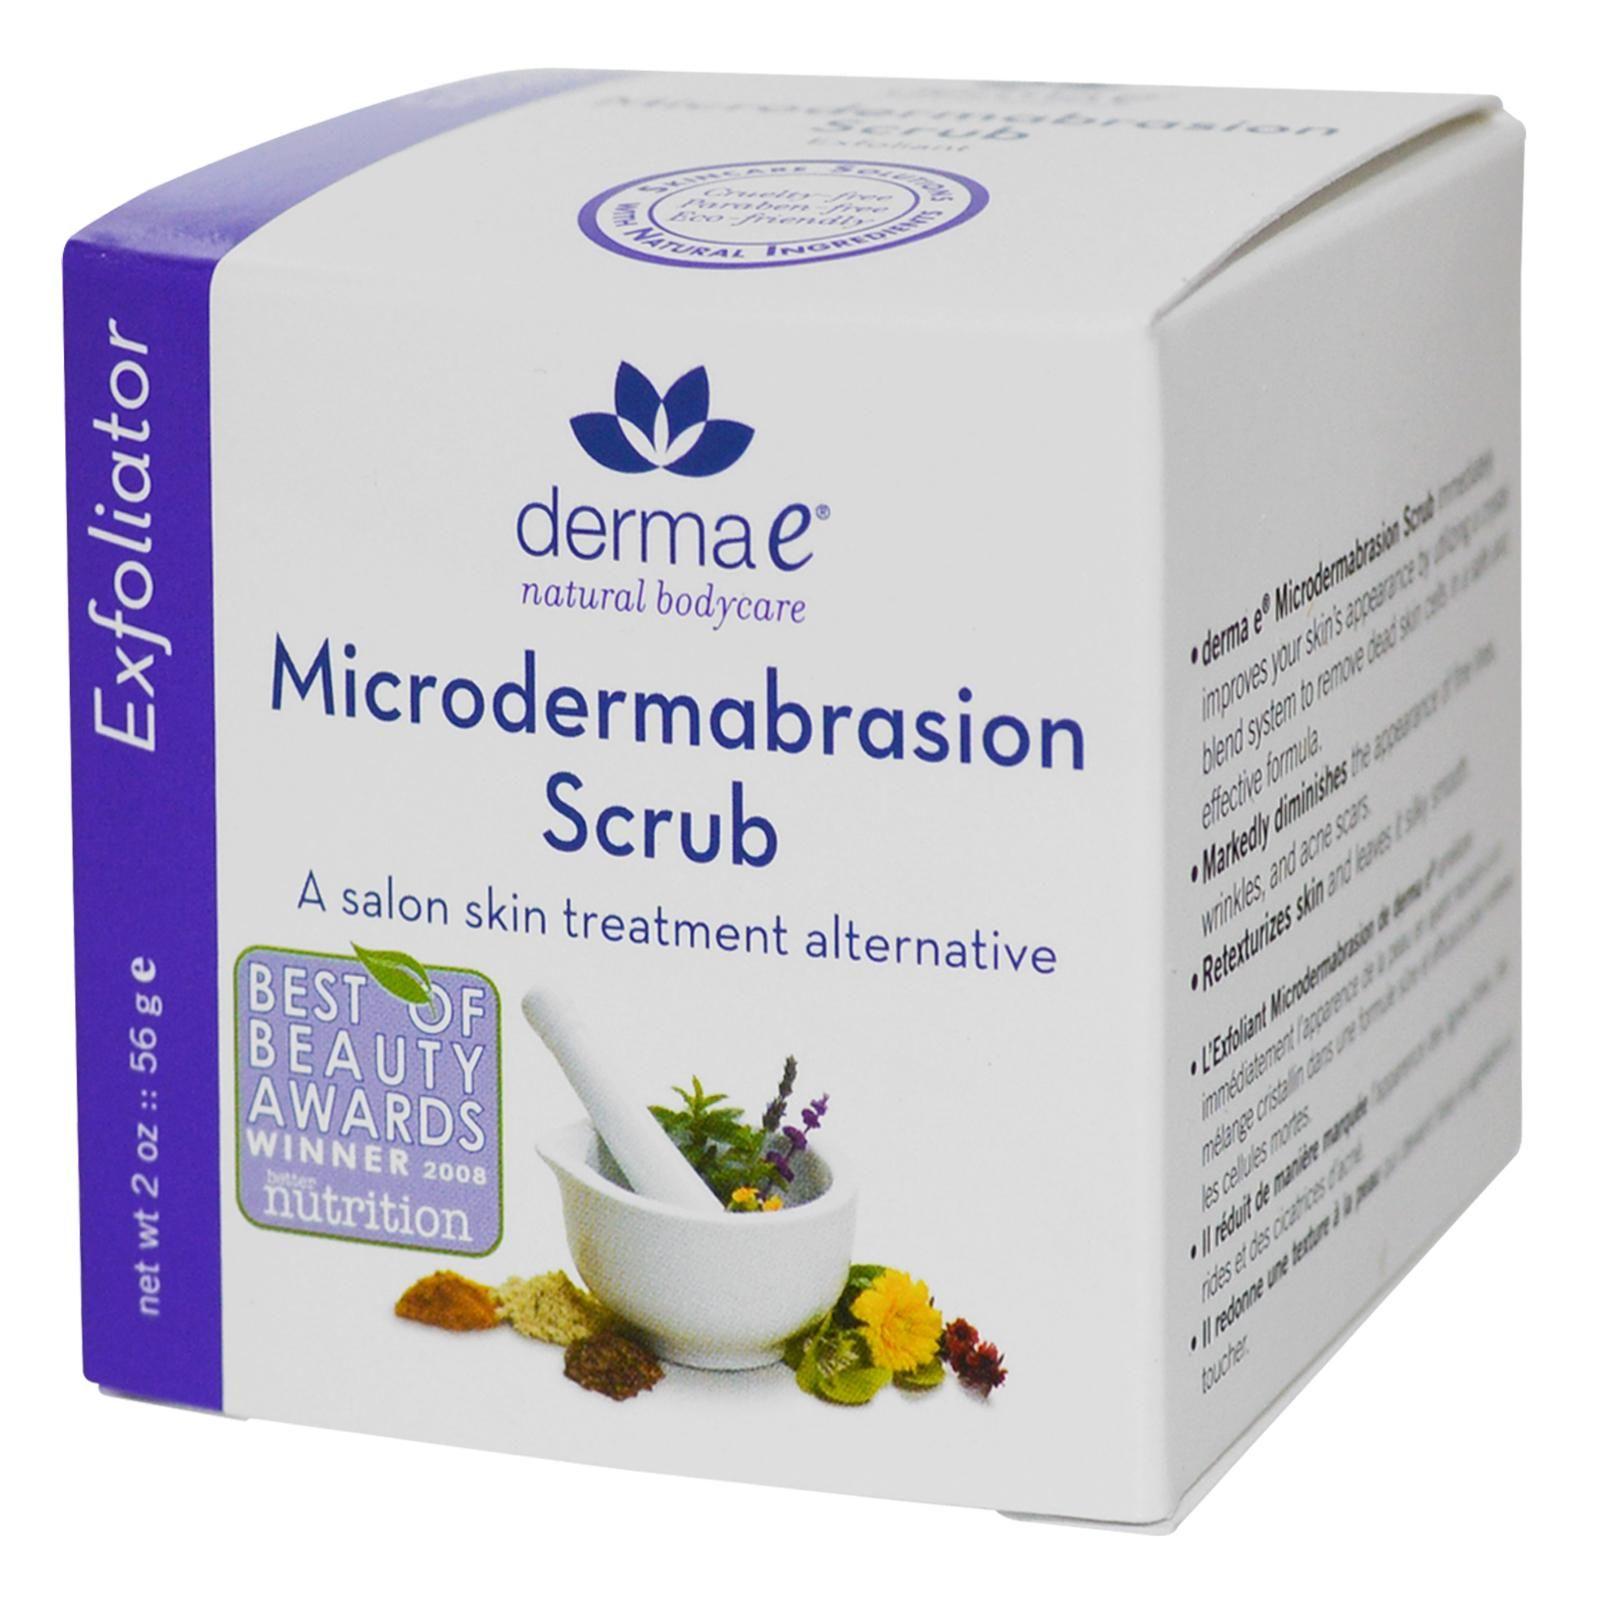 Derma E, Microdermabrasion Scrub, Exfoliator, 2 oz (56 g)  마이크로더마브레이션.